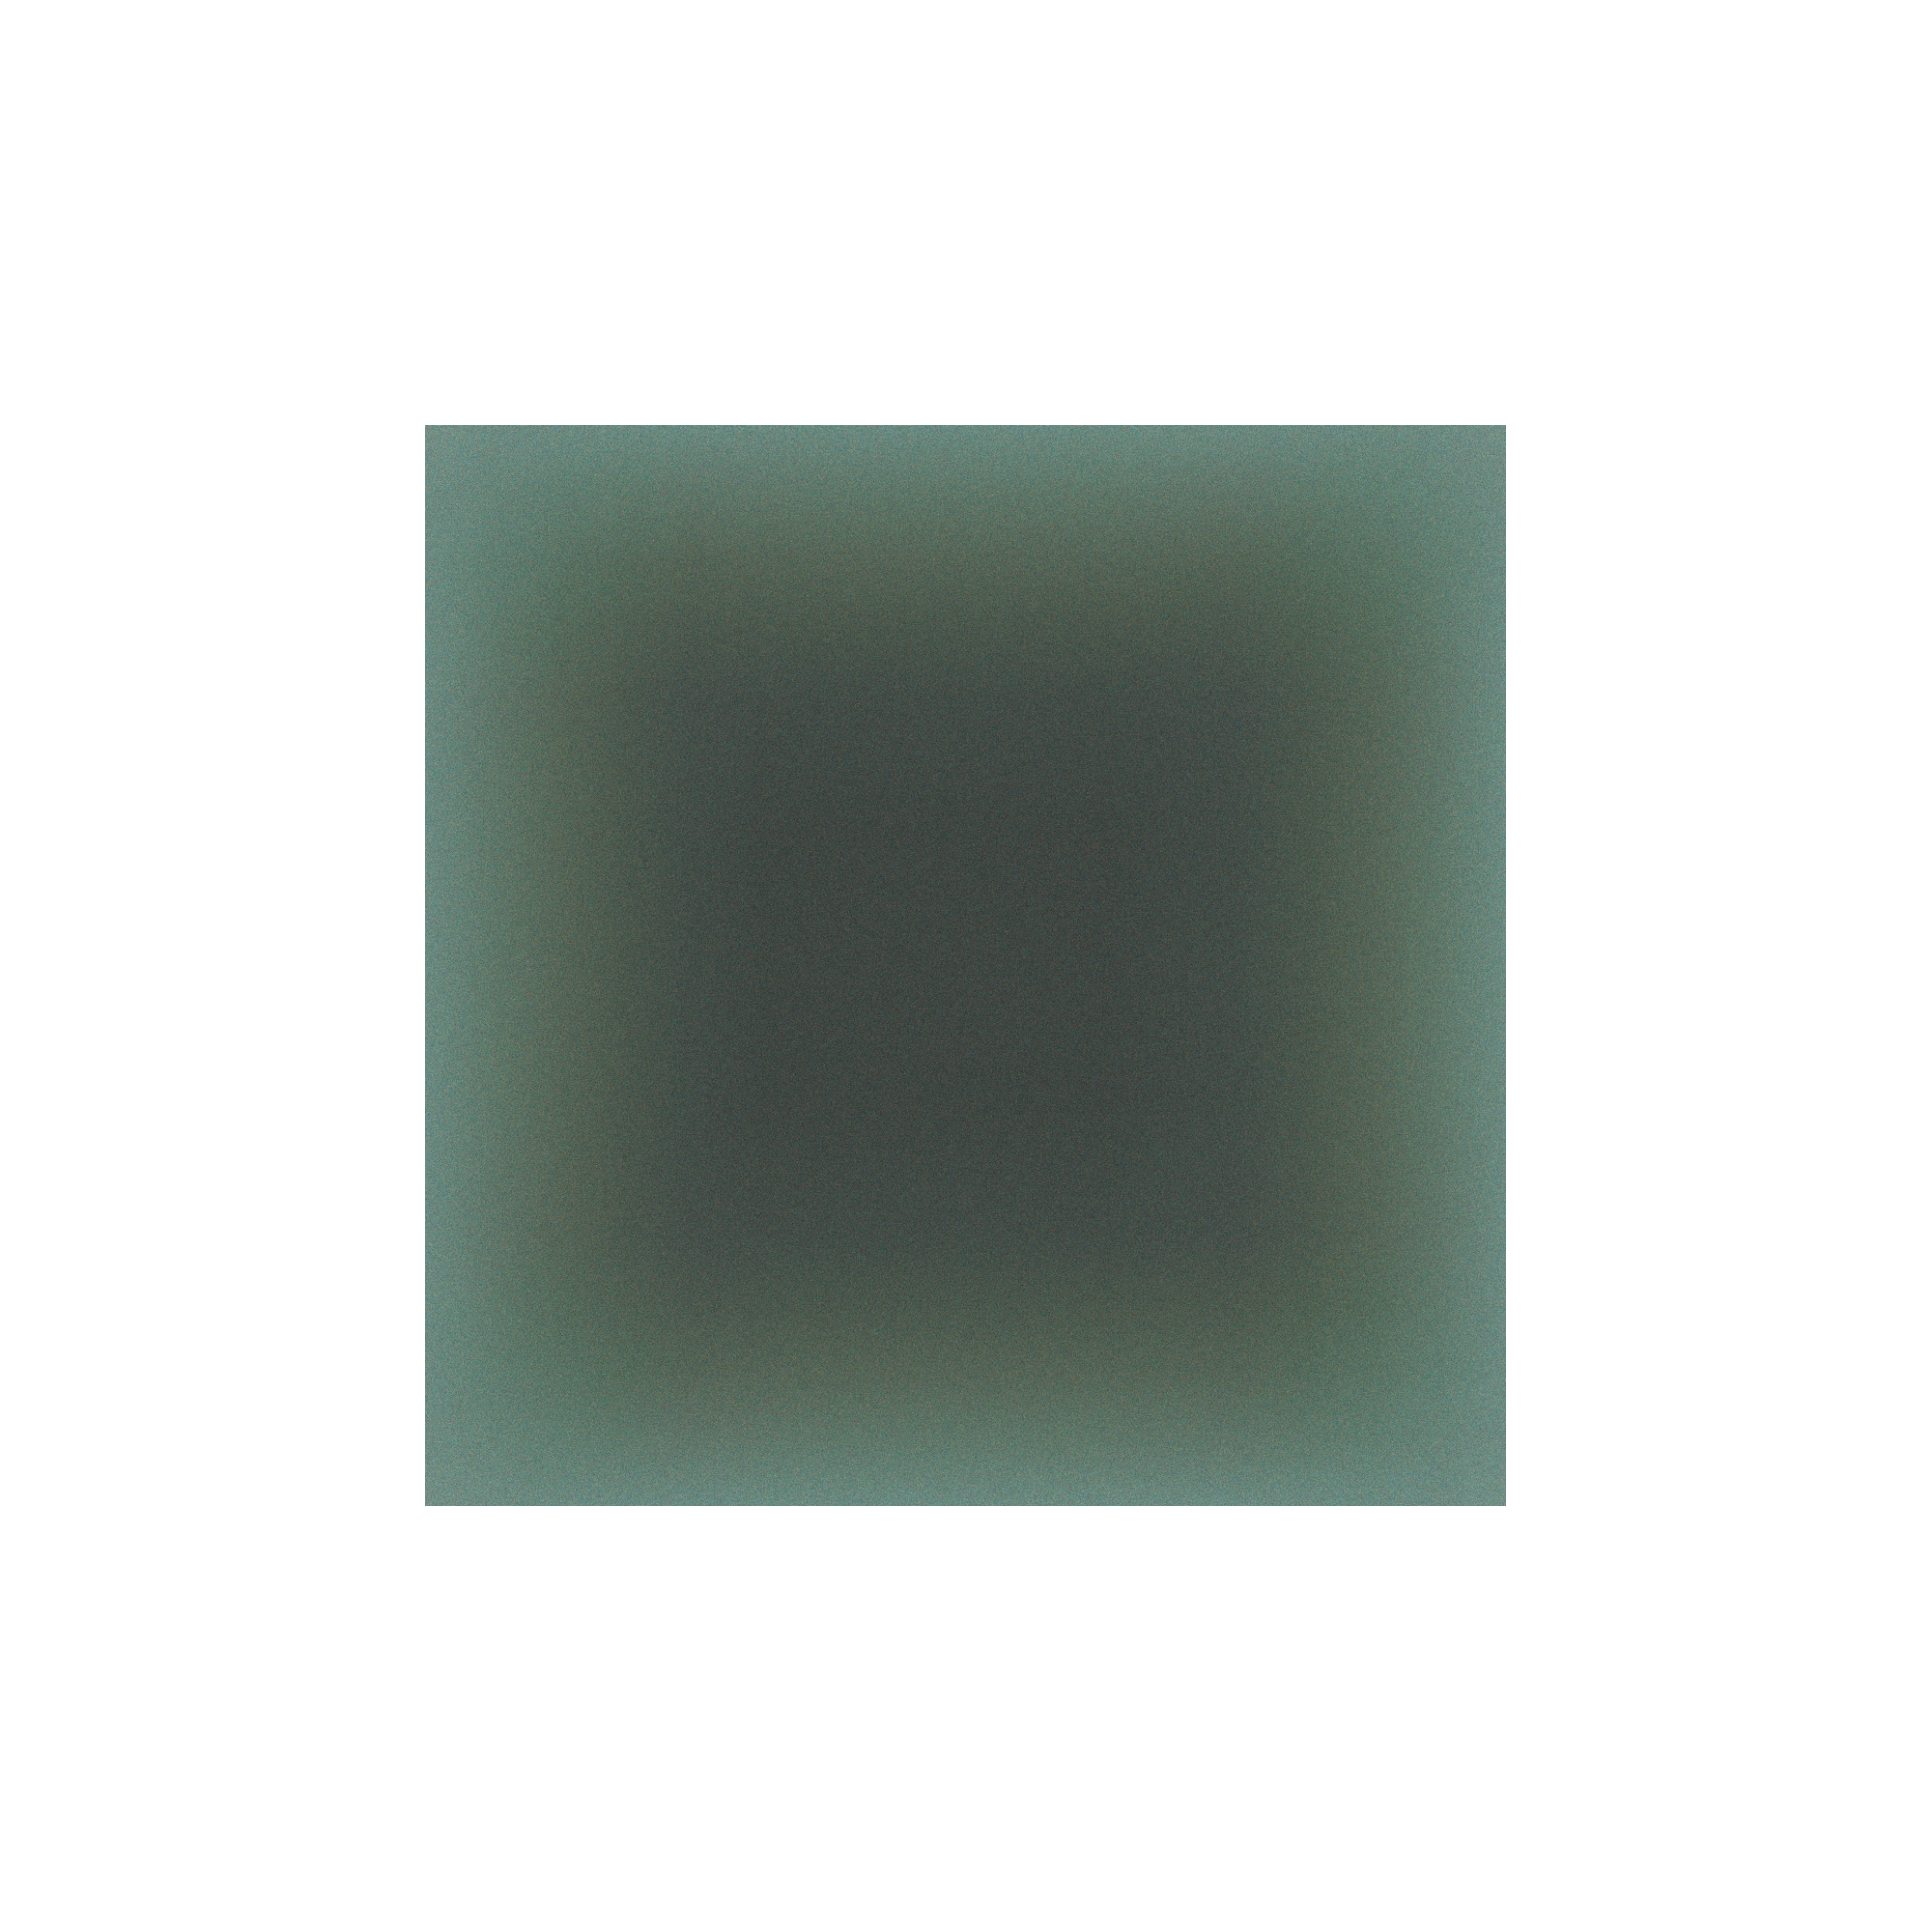 ruxandraduru_color_greensquare.jpg